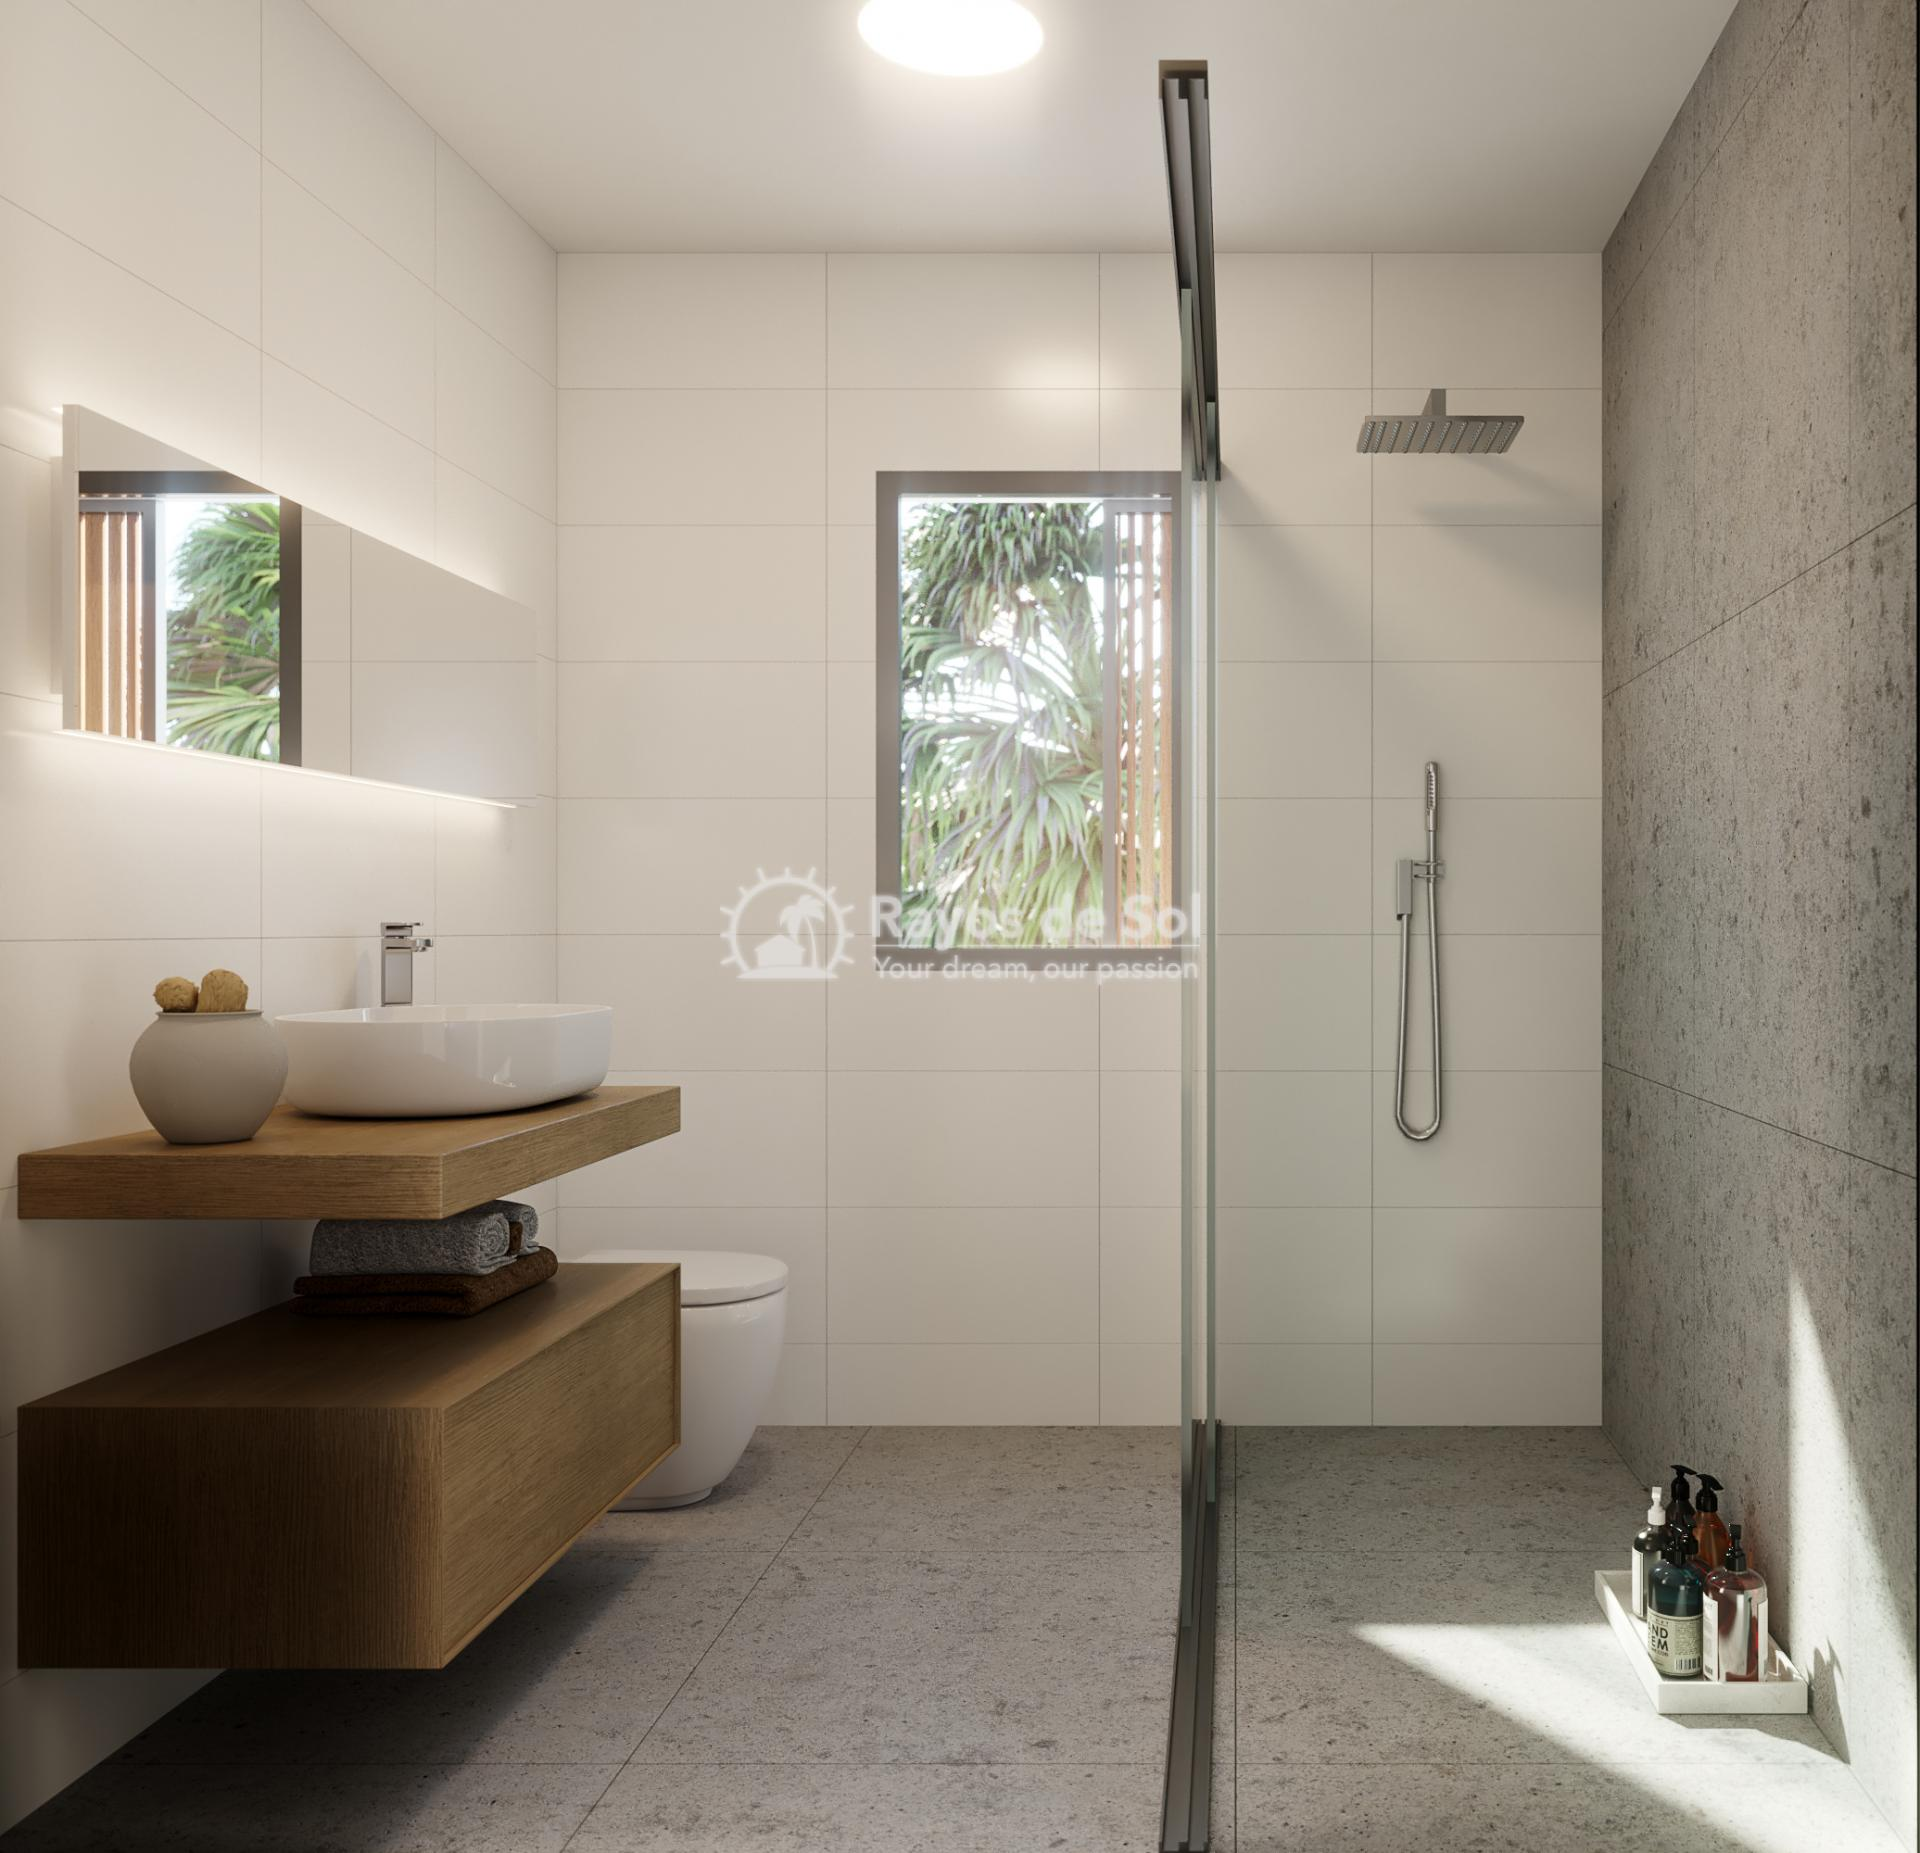 Luxury newbuild villa in La Finca Golf, Algorfa, Costa Blanca (LFPADI) - 14